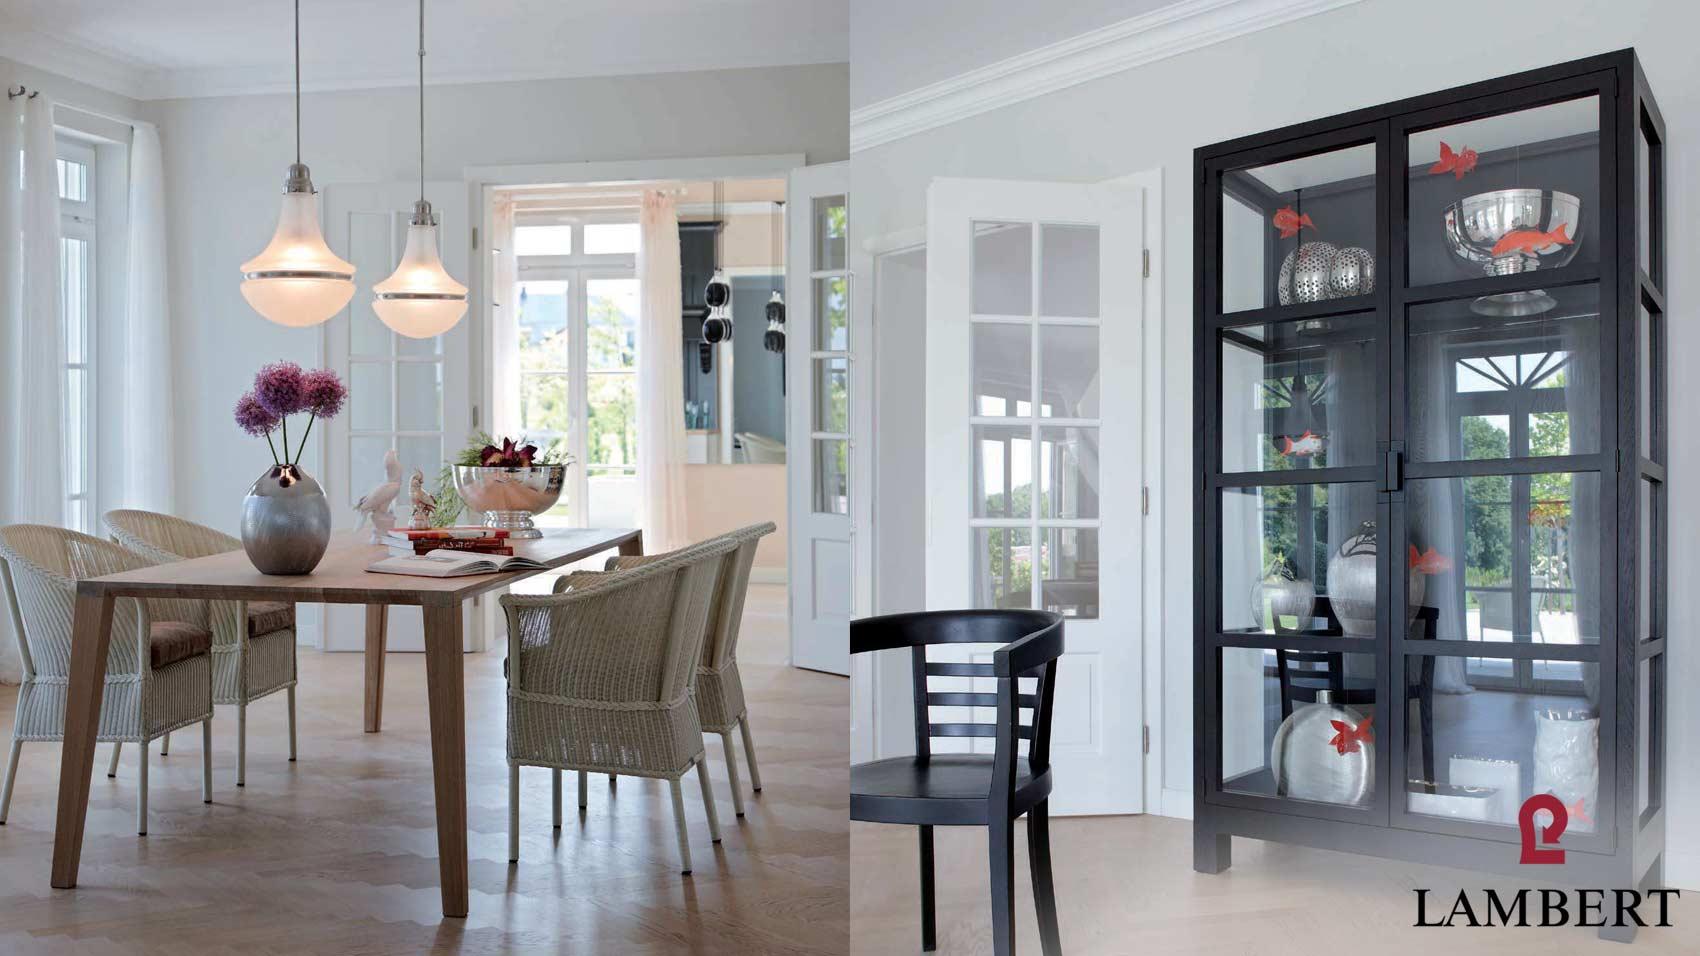 Möbel Jena lambert wohnaccessoires nahe erfurt jena weimar möbel u küchen